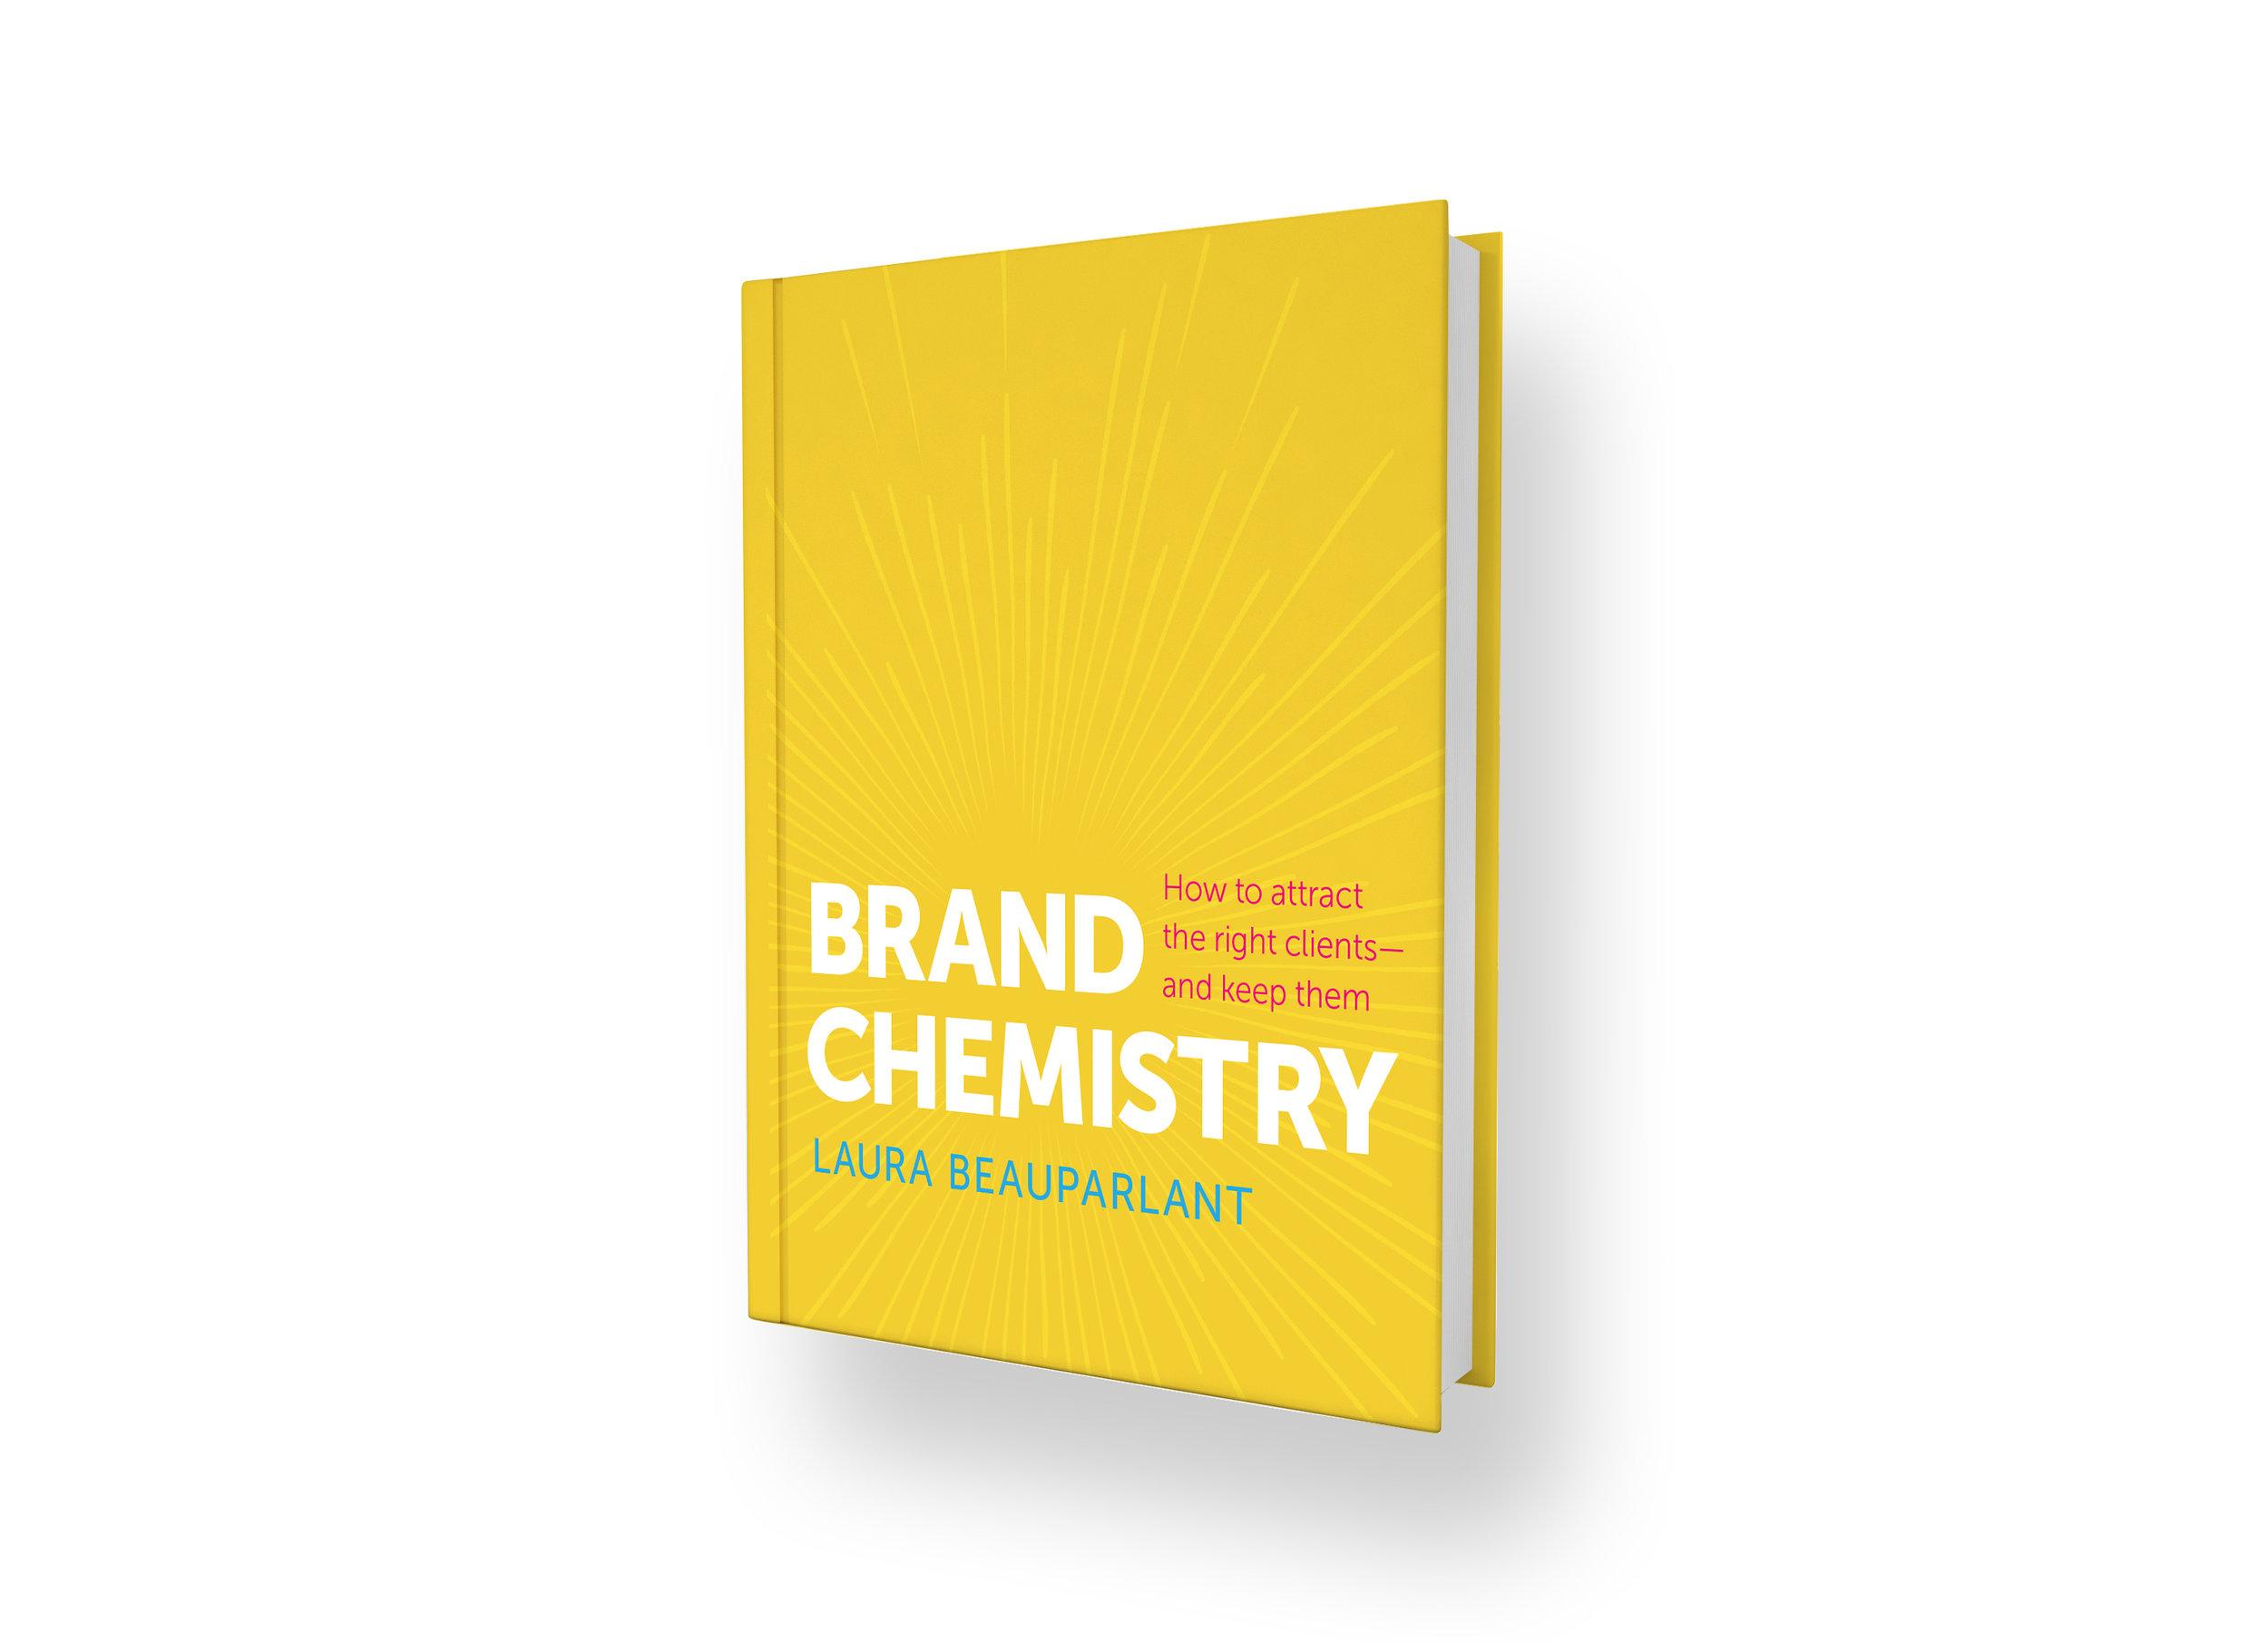 BrandCh_Book2.jpg